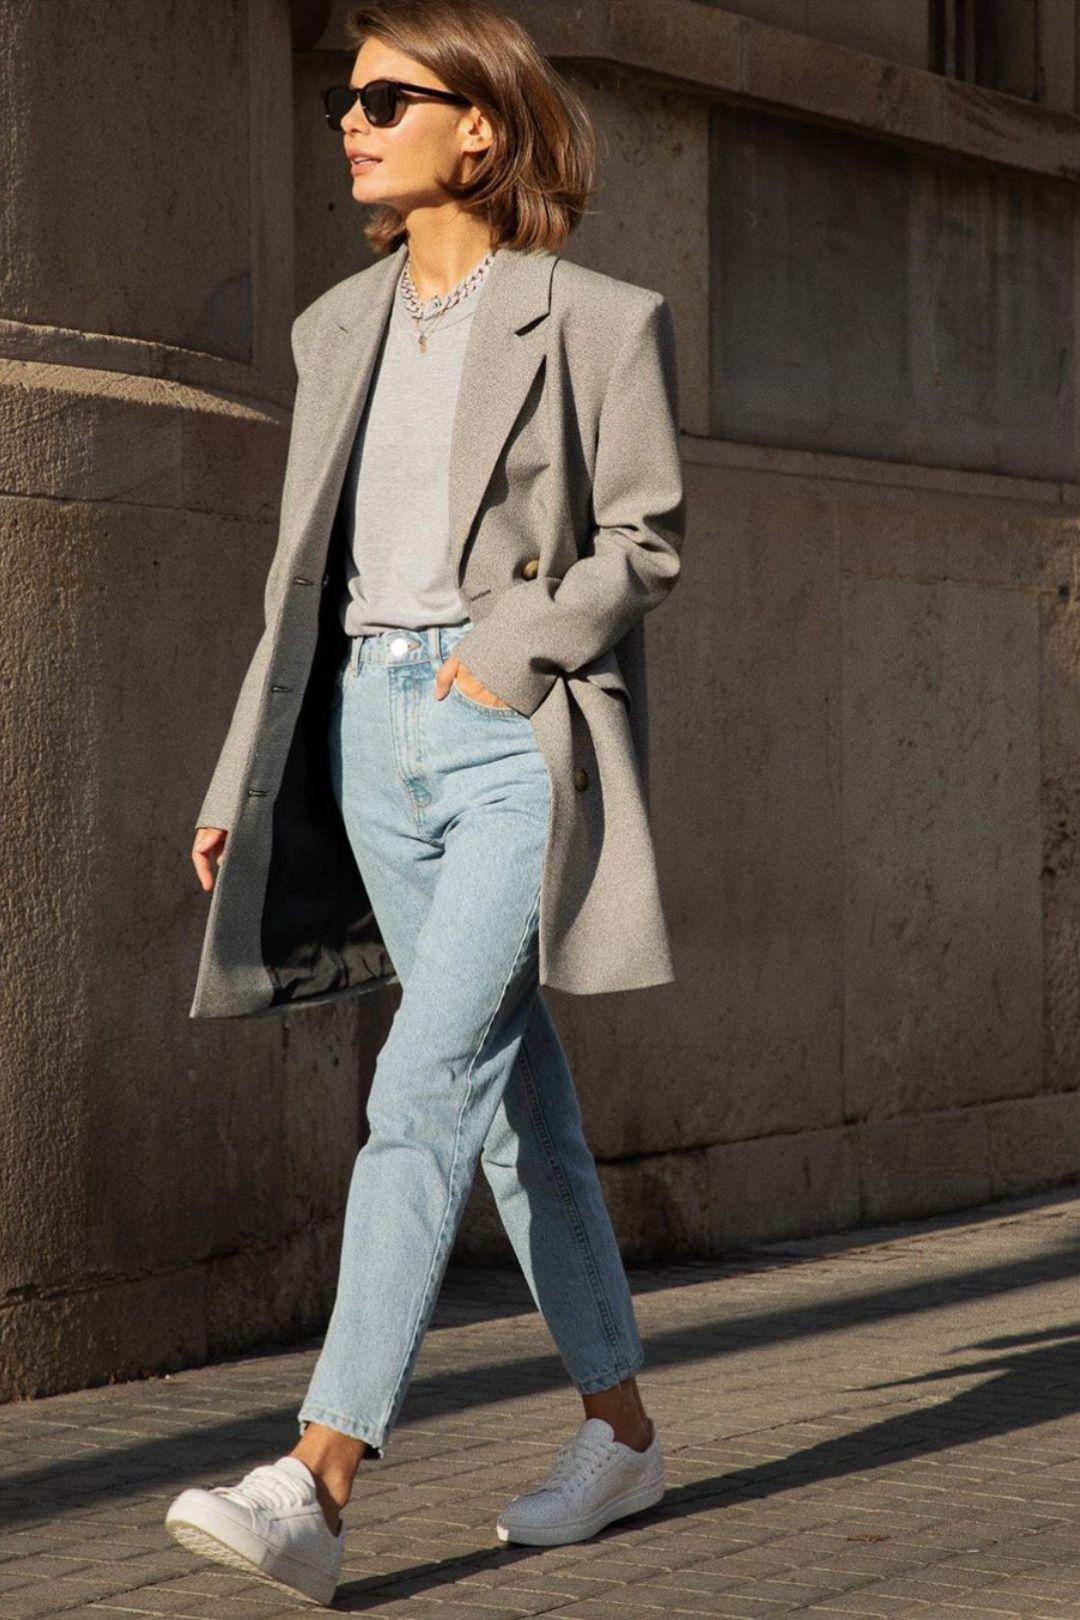 Fashion Style Tips Ideas - SalePrice:$18 Per - Fashion Tips For Plus Size .Fashion Tips